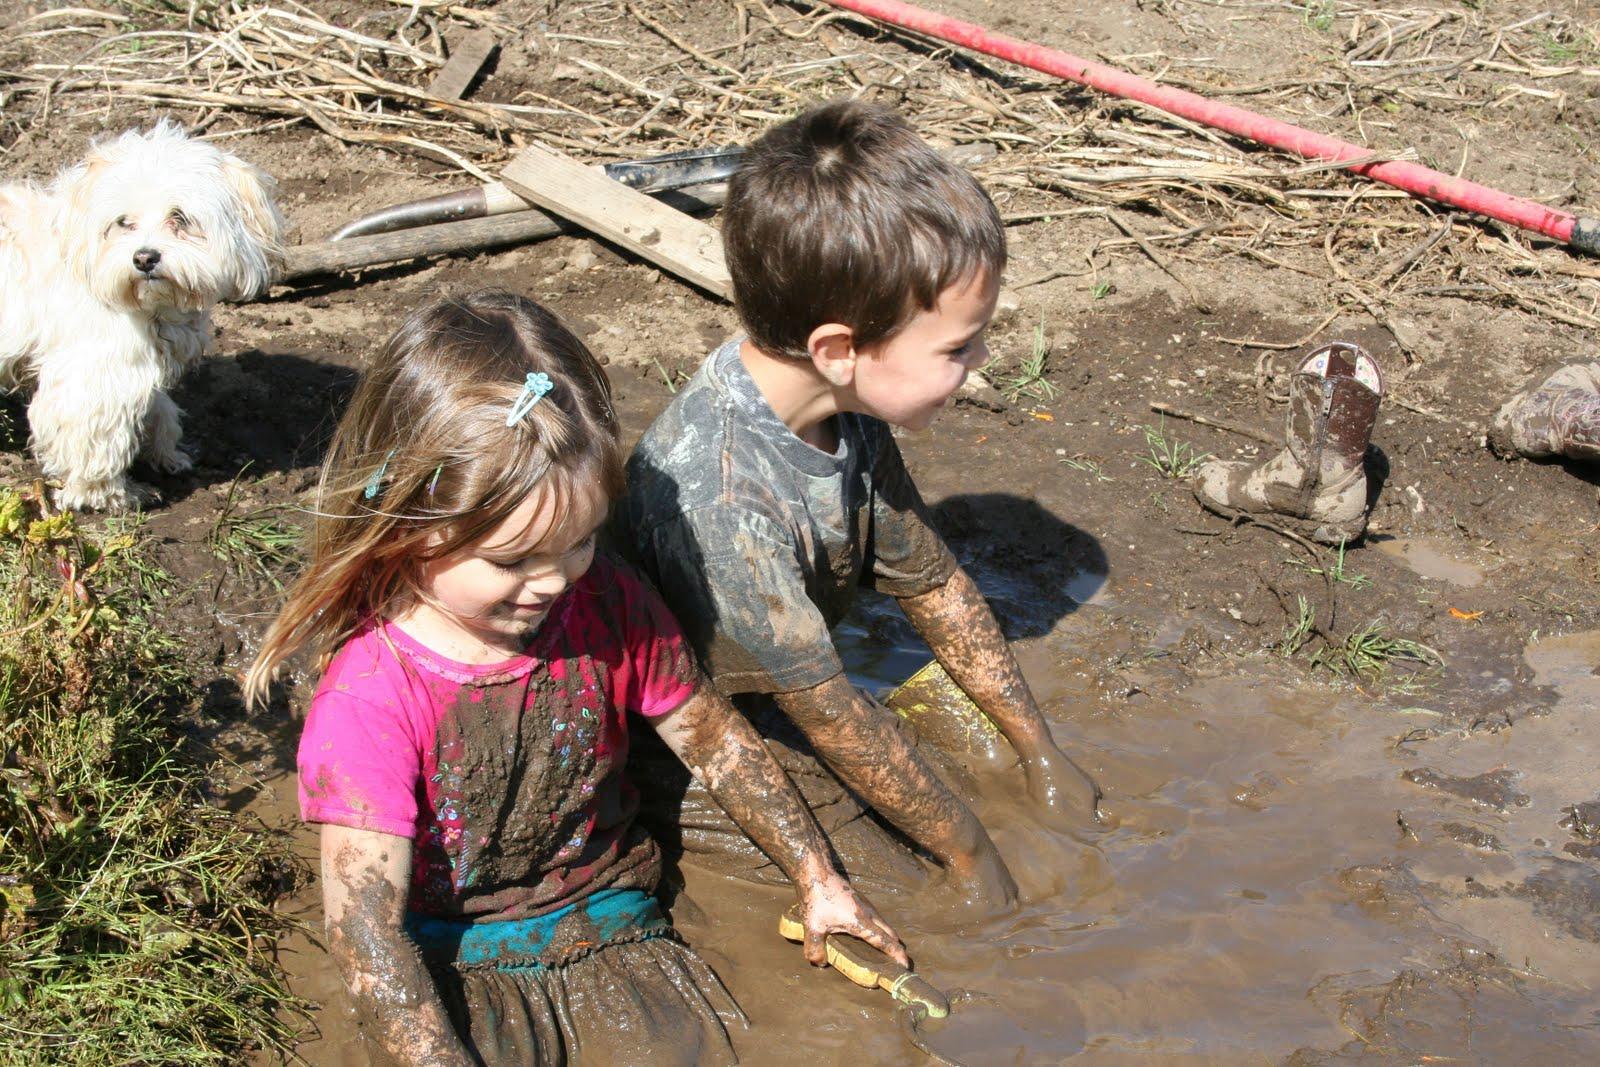 http://1.bp.blogspot.com/_kZKsXAZ_AsY/S9JWXw5RQEI/AAAAAAAABxg/vxNouVJu3iY/s1600/mud+bath1.jpg